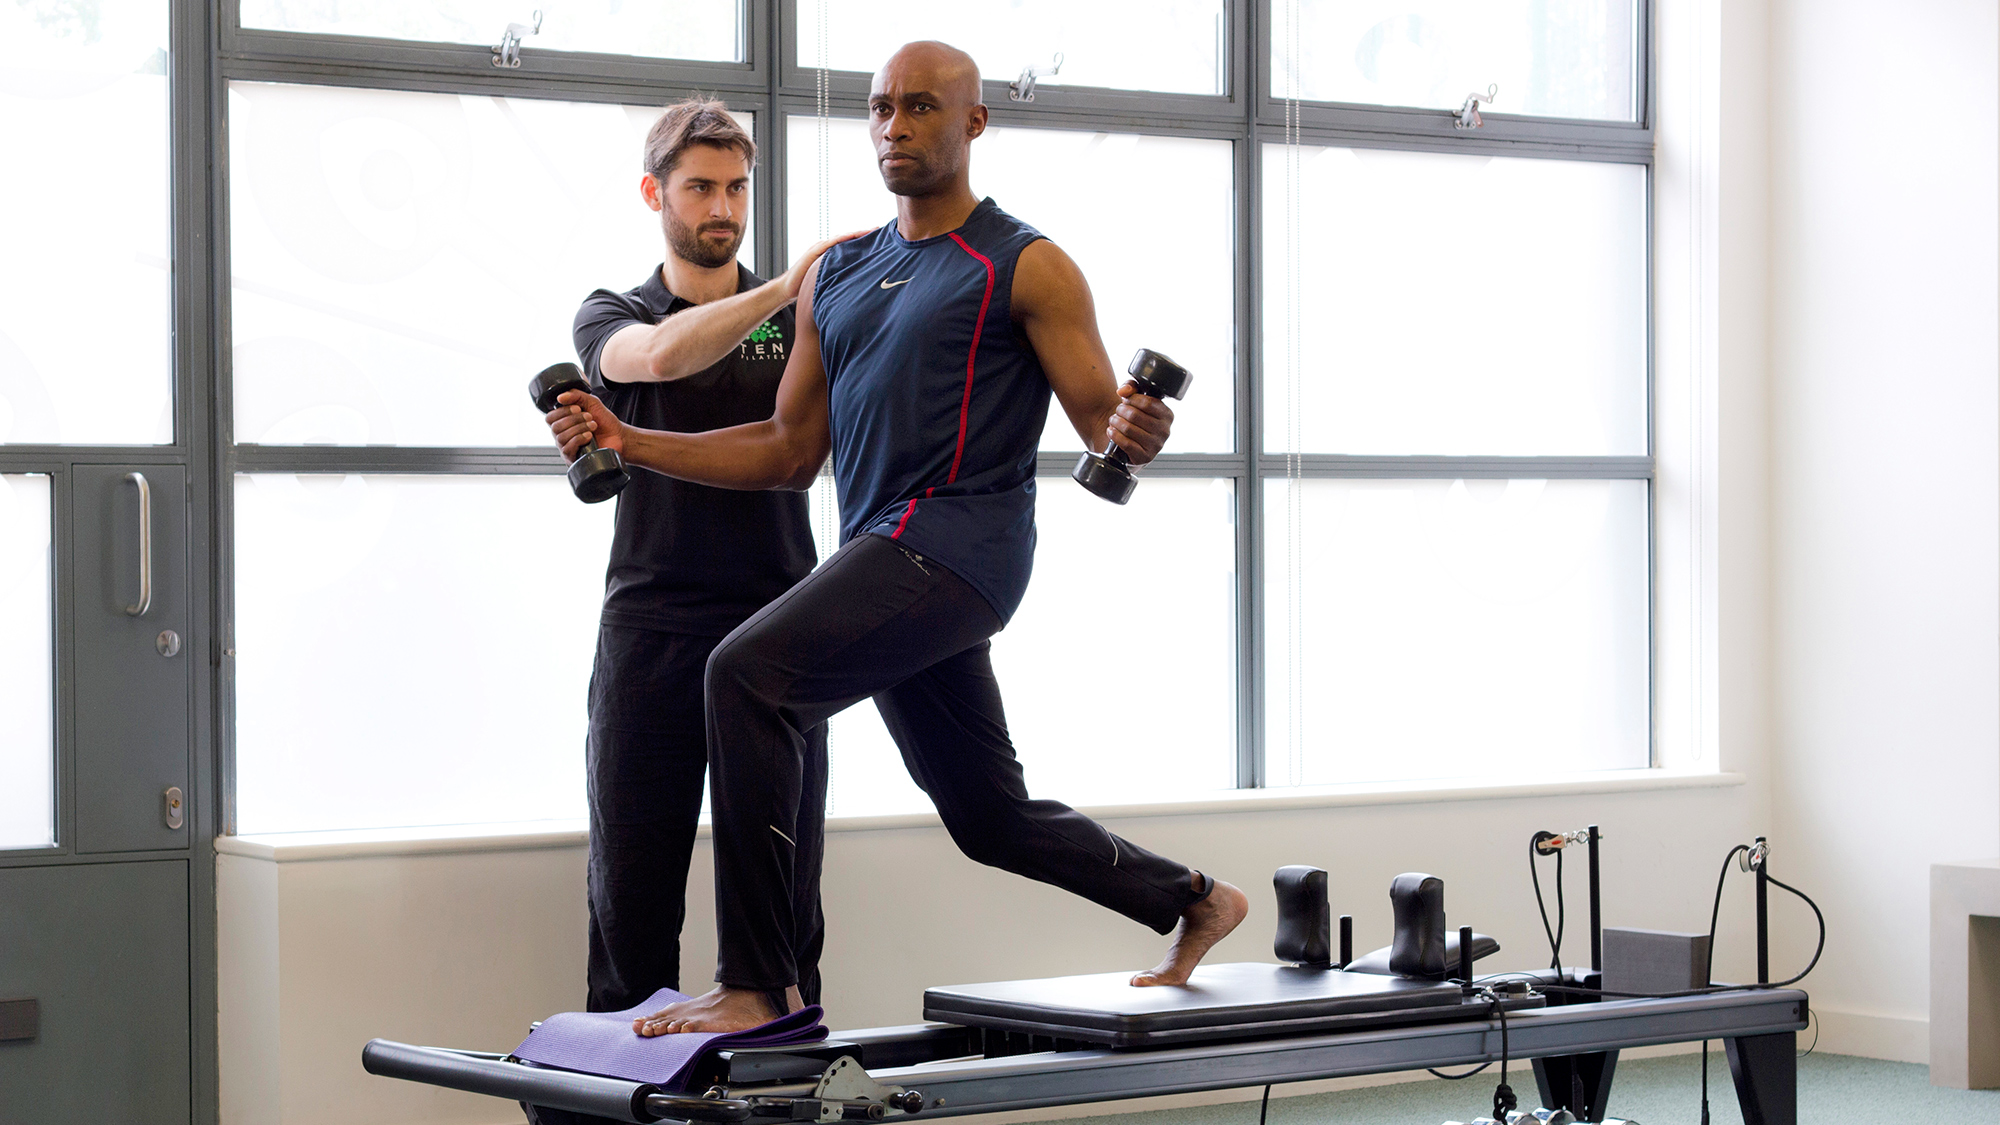 Image result for pilates for men